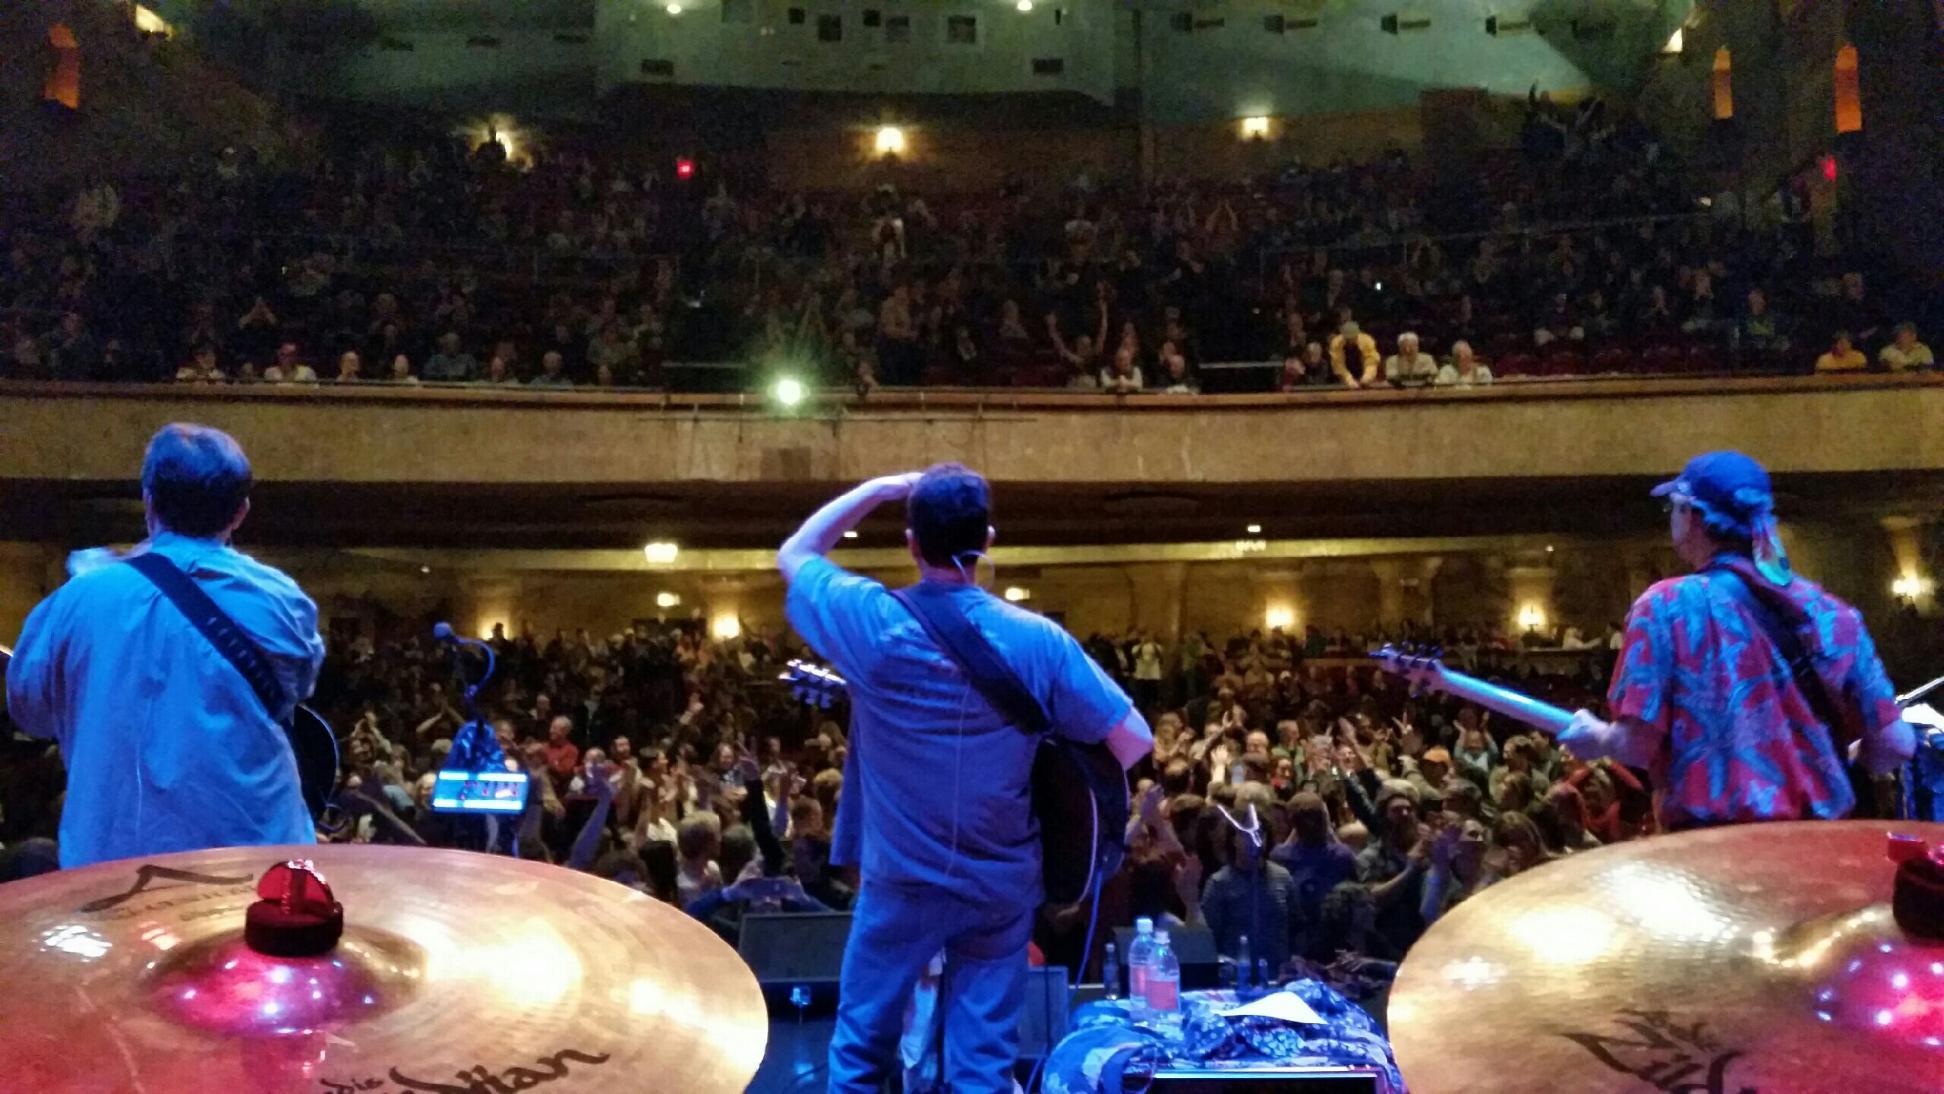 050817 - State Theatre 1.jpg